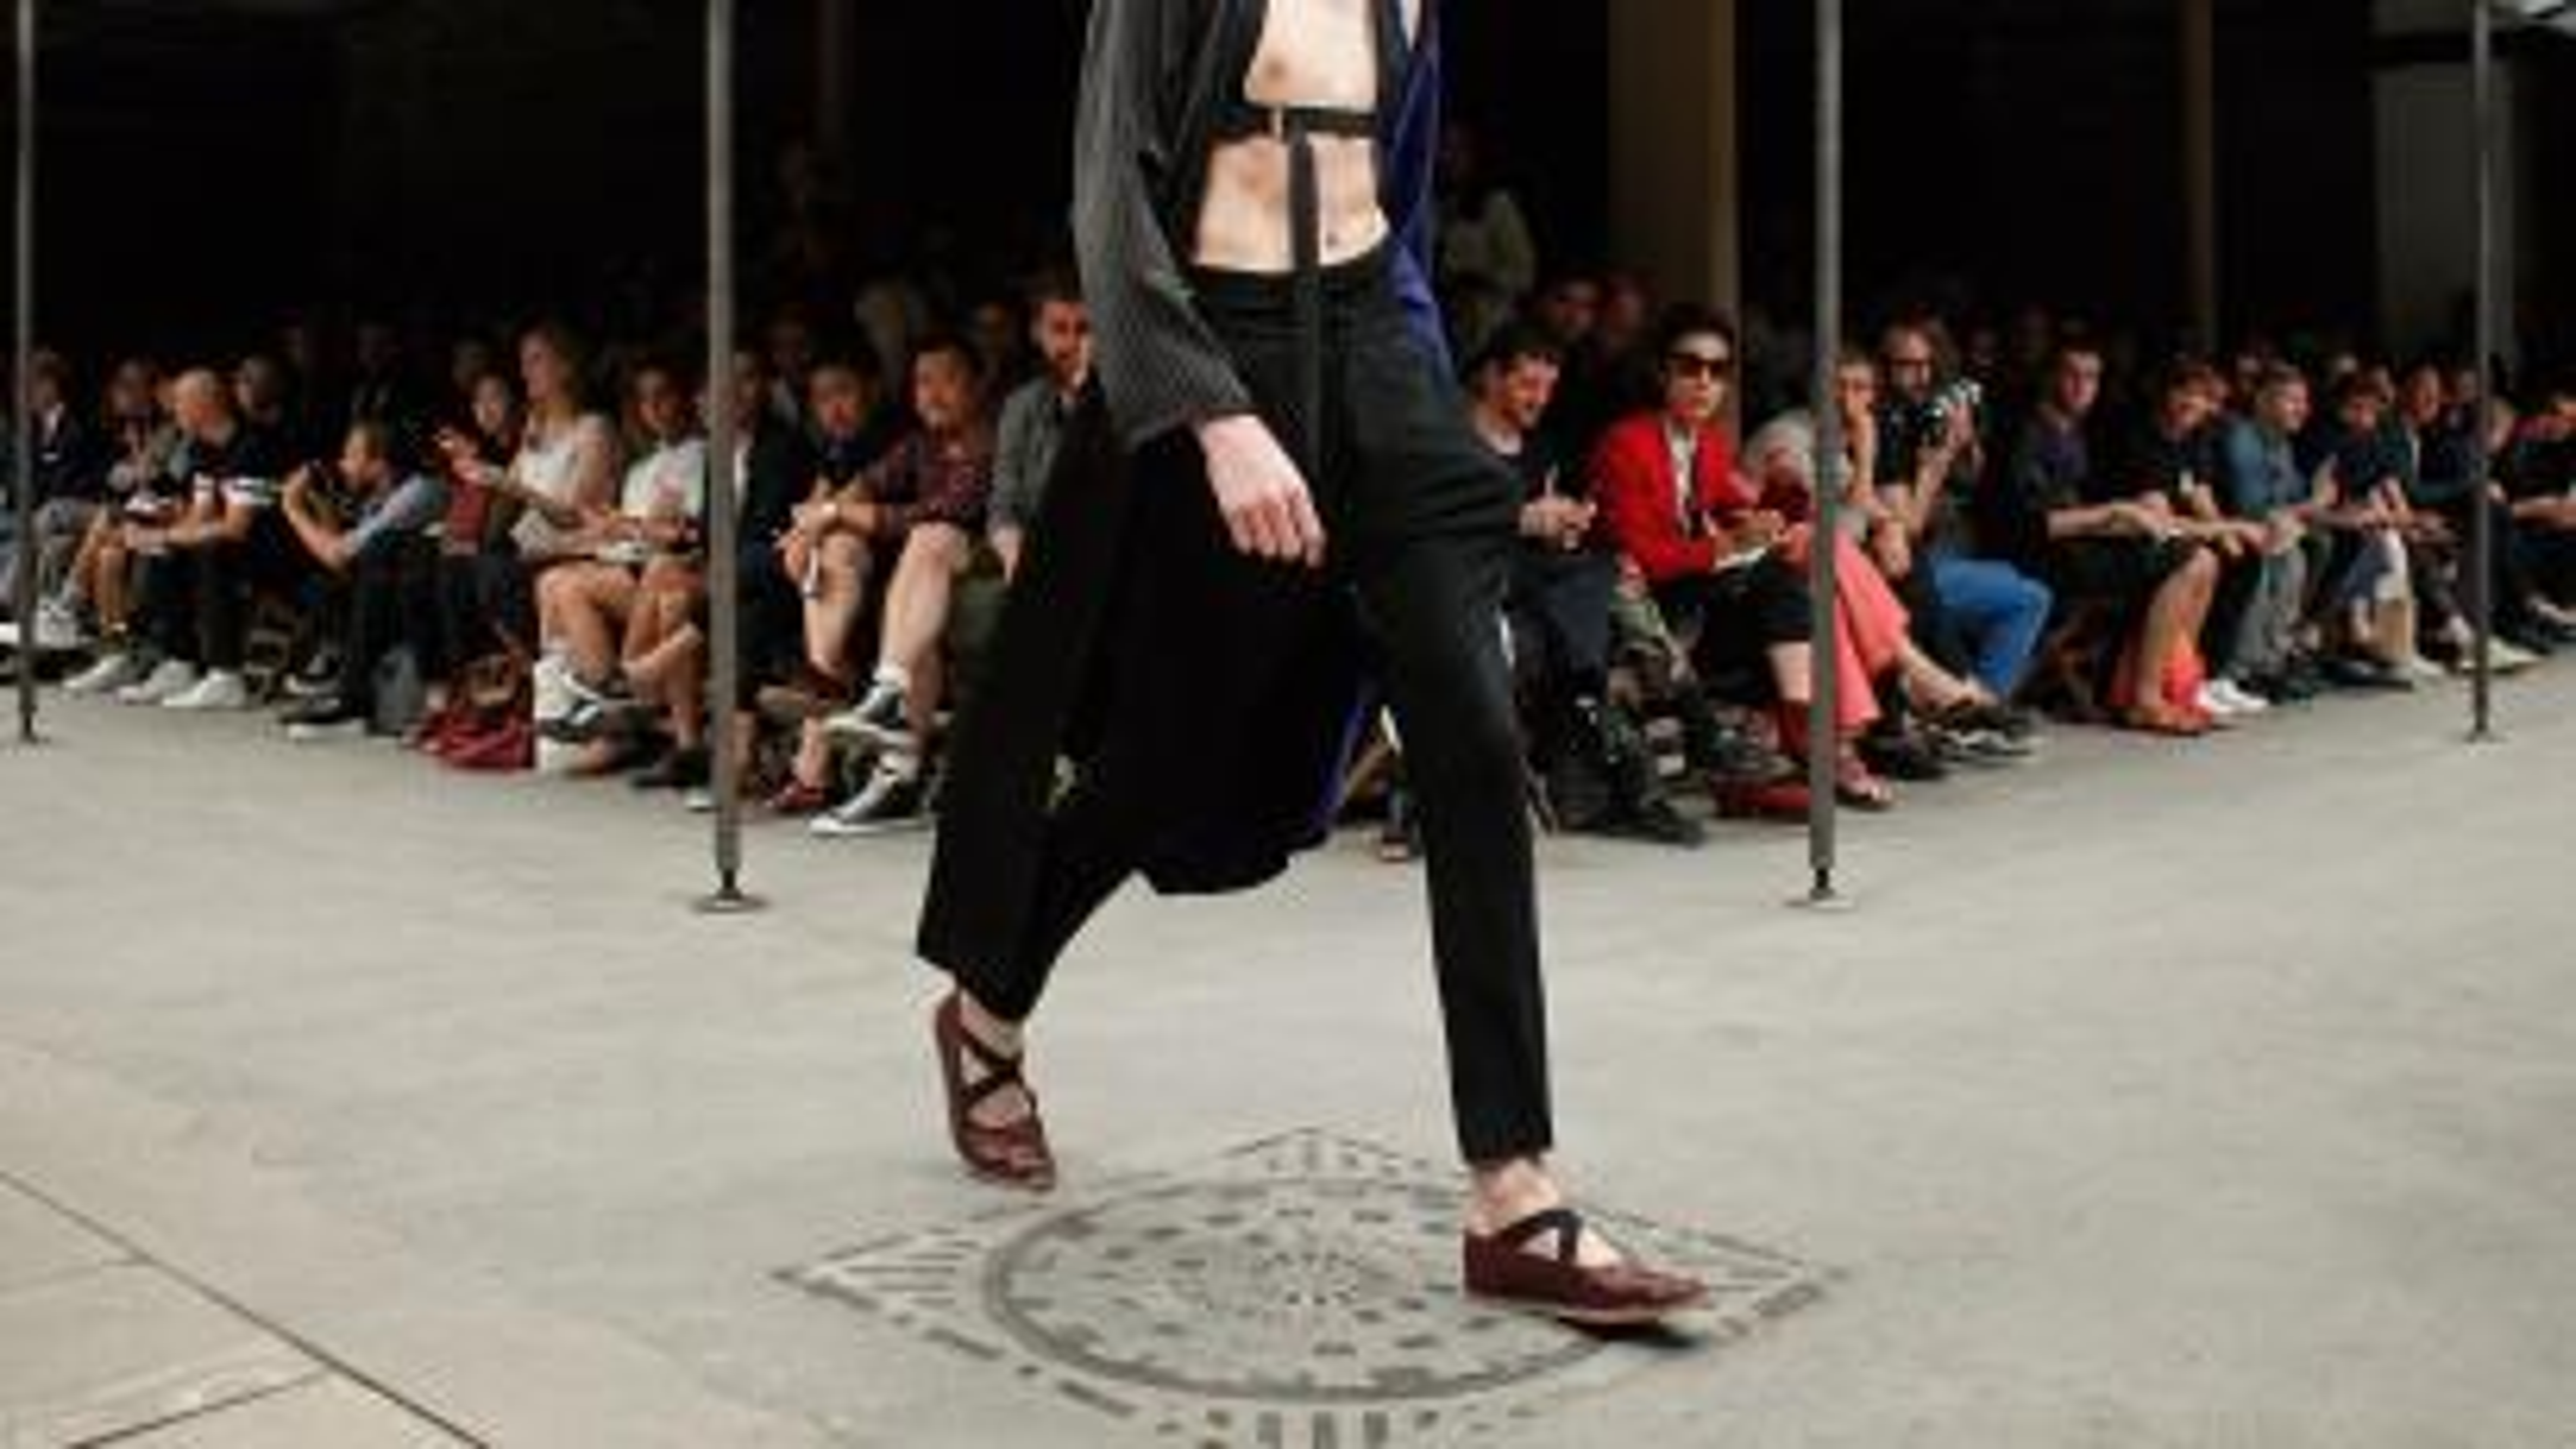 dries van noten, menswear, fashion, style, lifestyle, spring 2015, paris fashion week, sweatpants